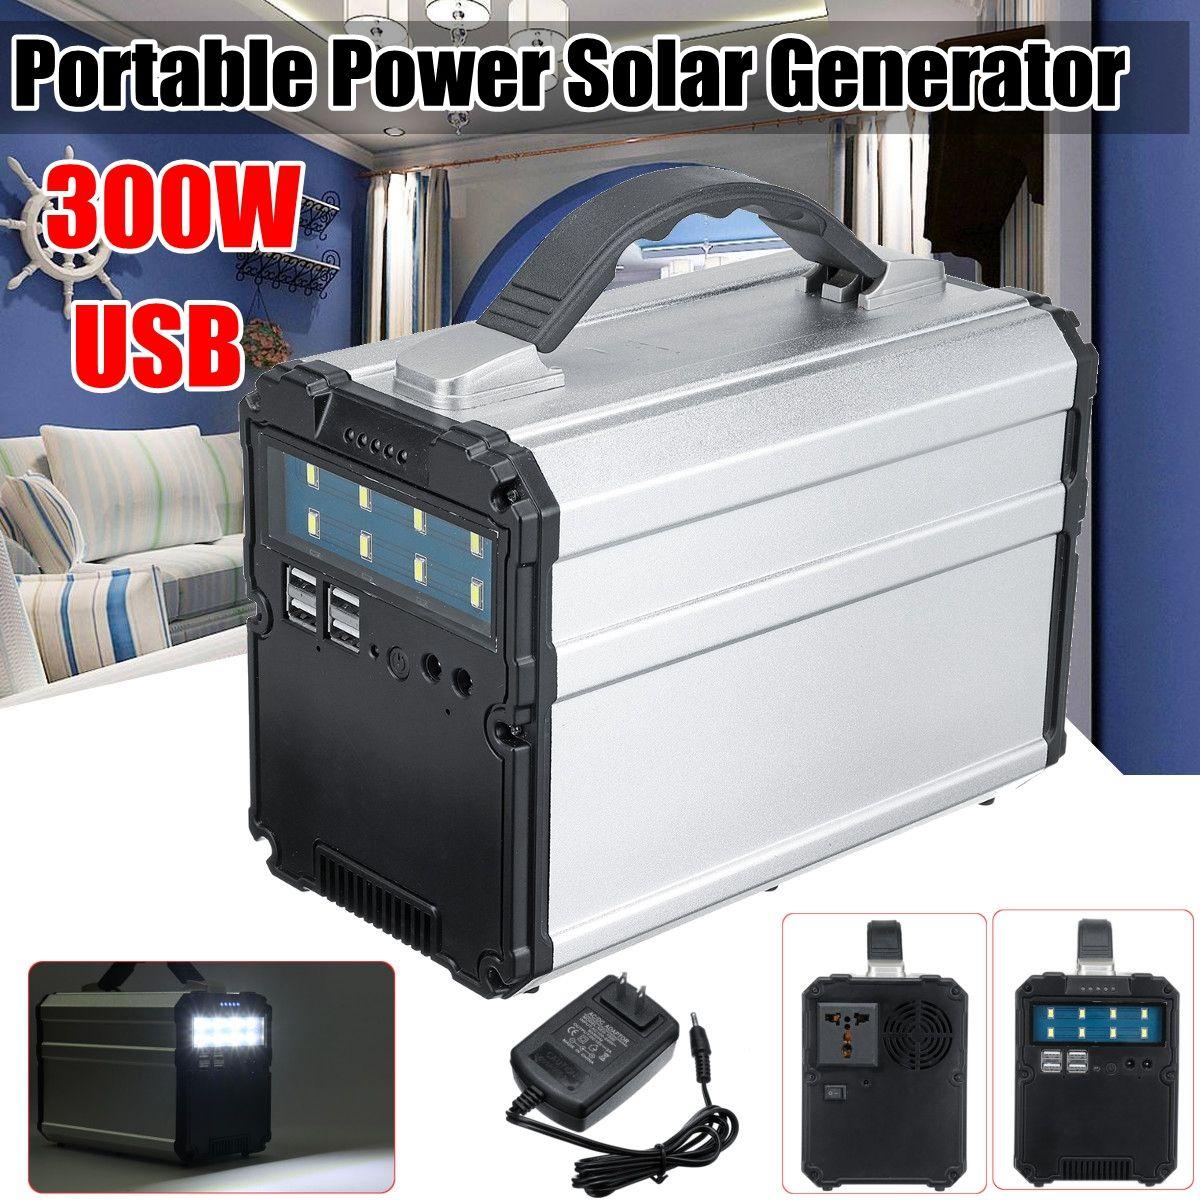 300WH 300 watt 12 v 15A Inverter Hause Im Freien Tragbare solar generator Power Lagerung schneller USB ladegerät